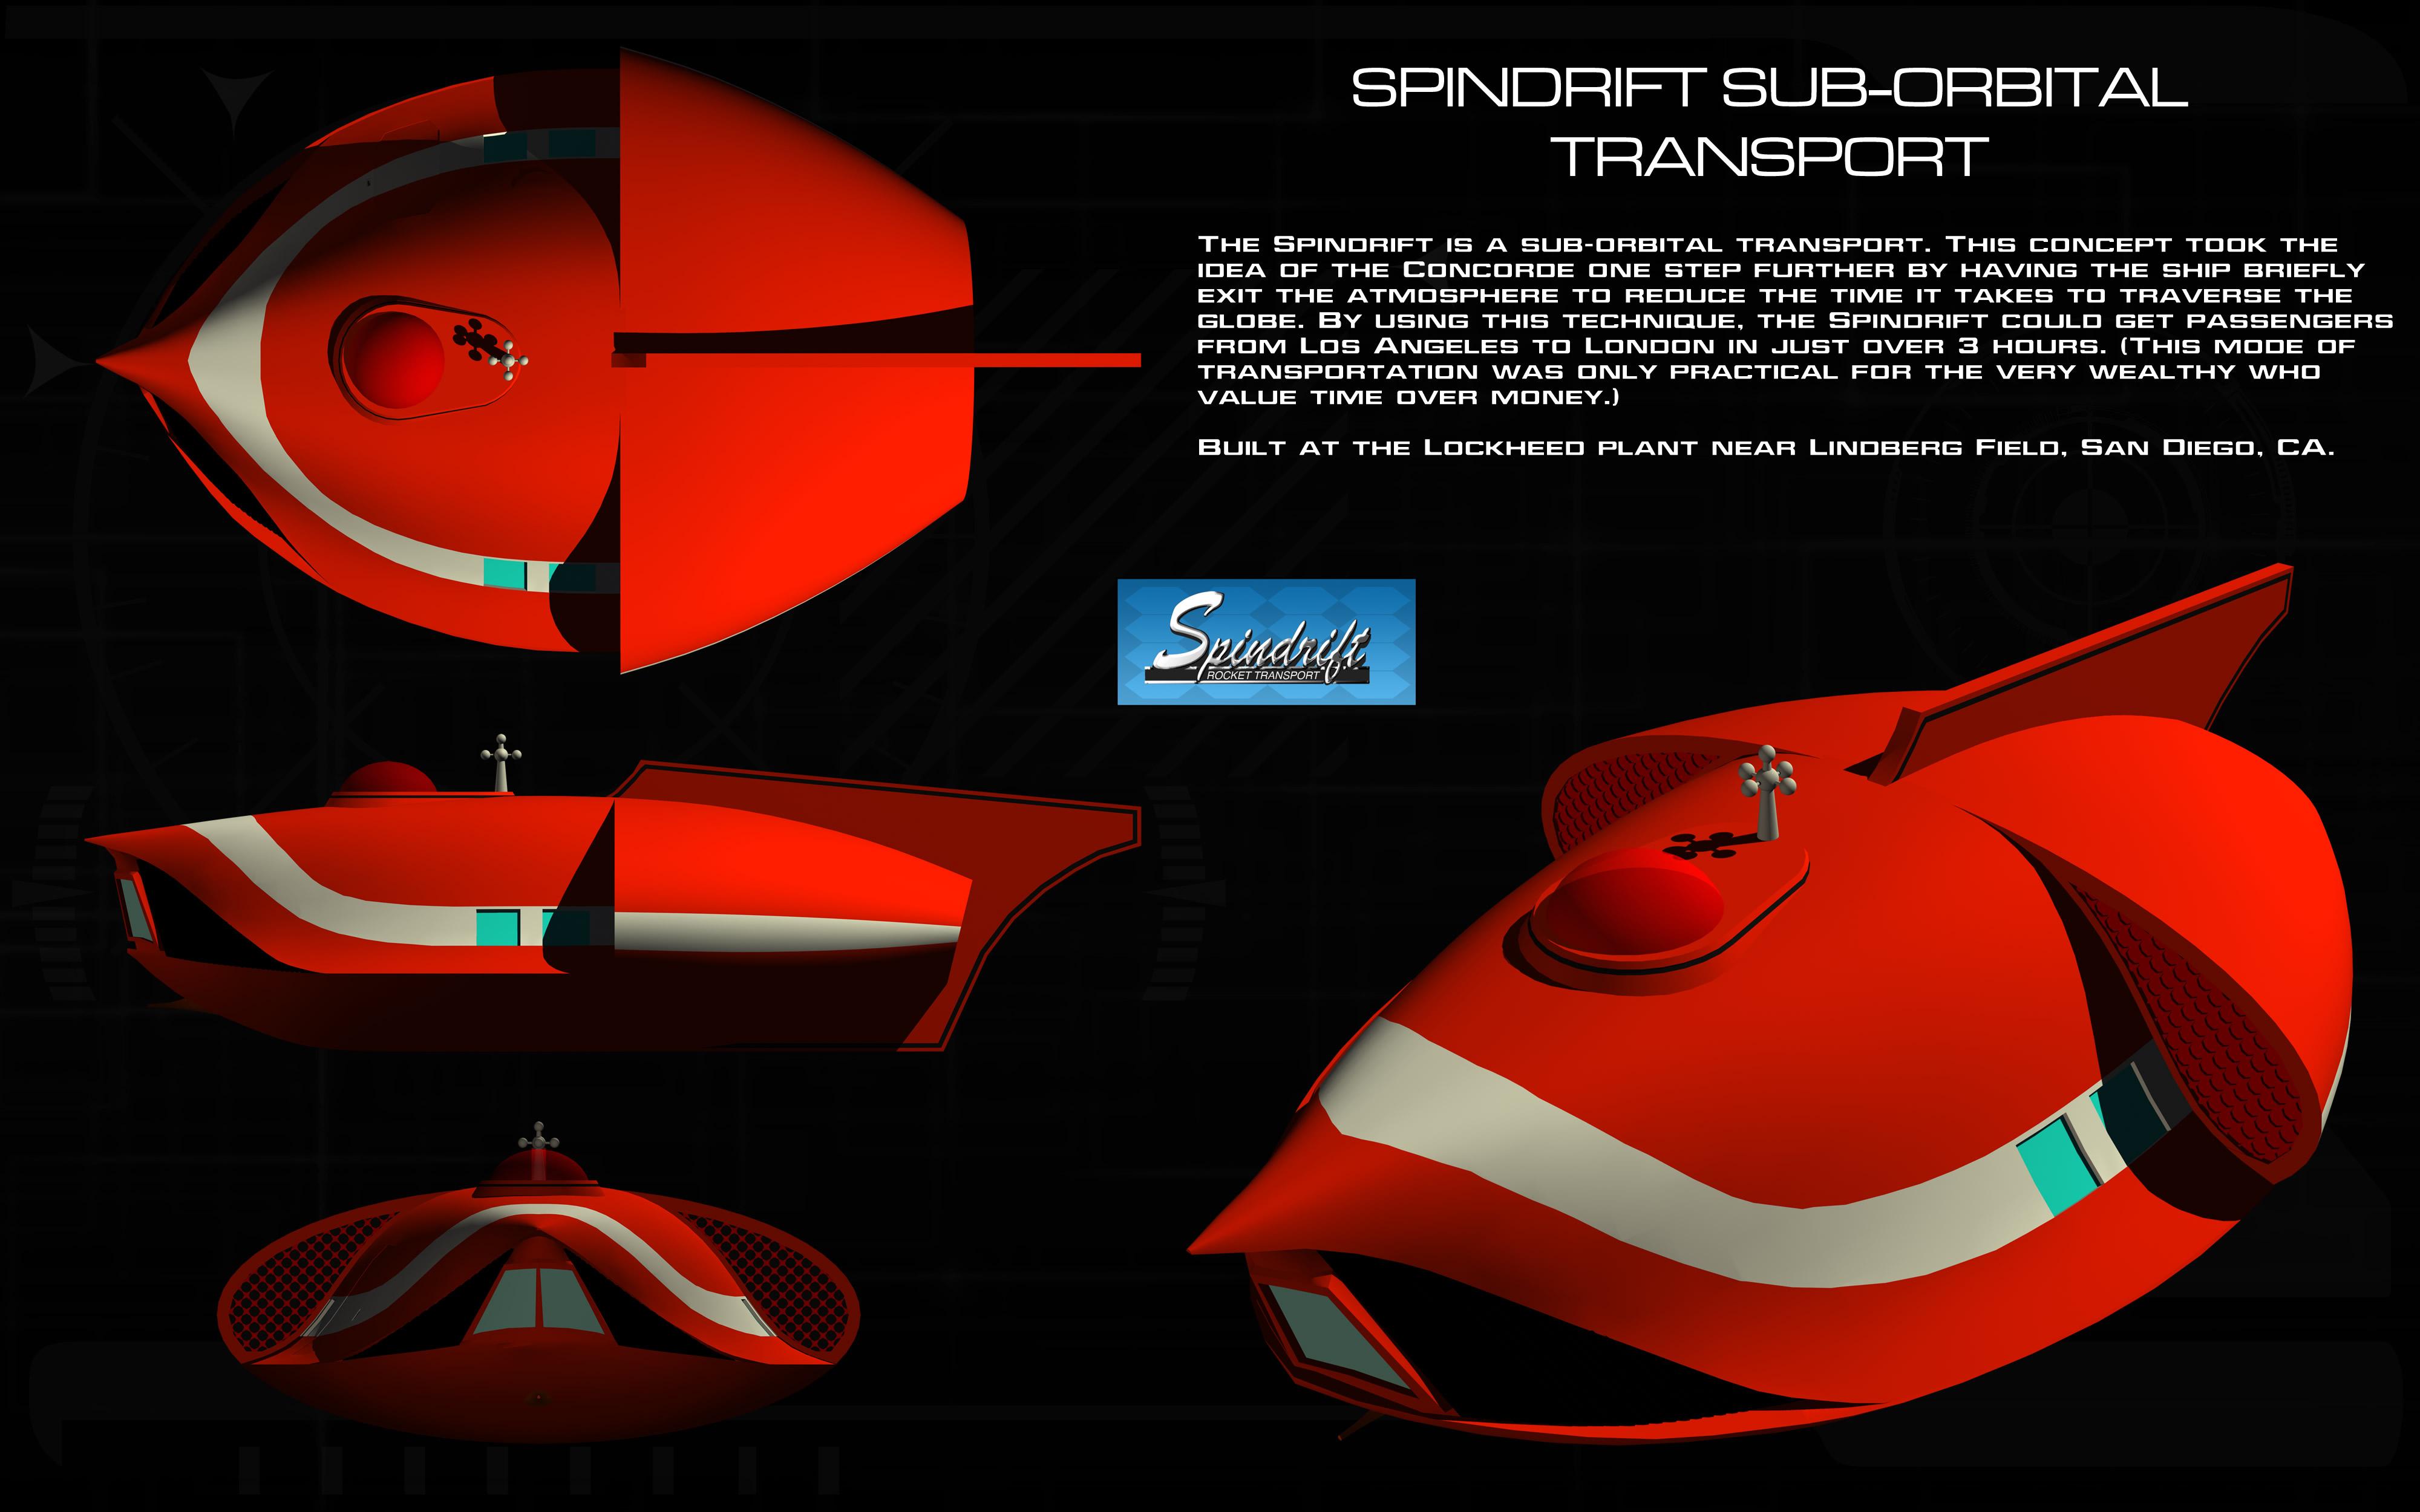 Spindrift ortho by unusualsuspex on DeviantArt.